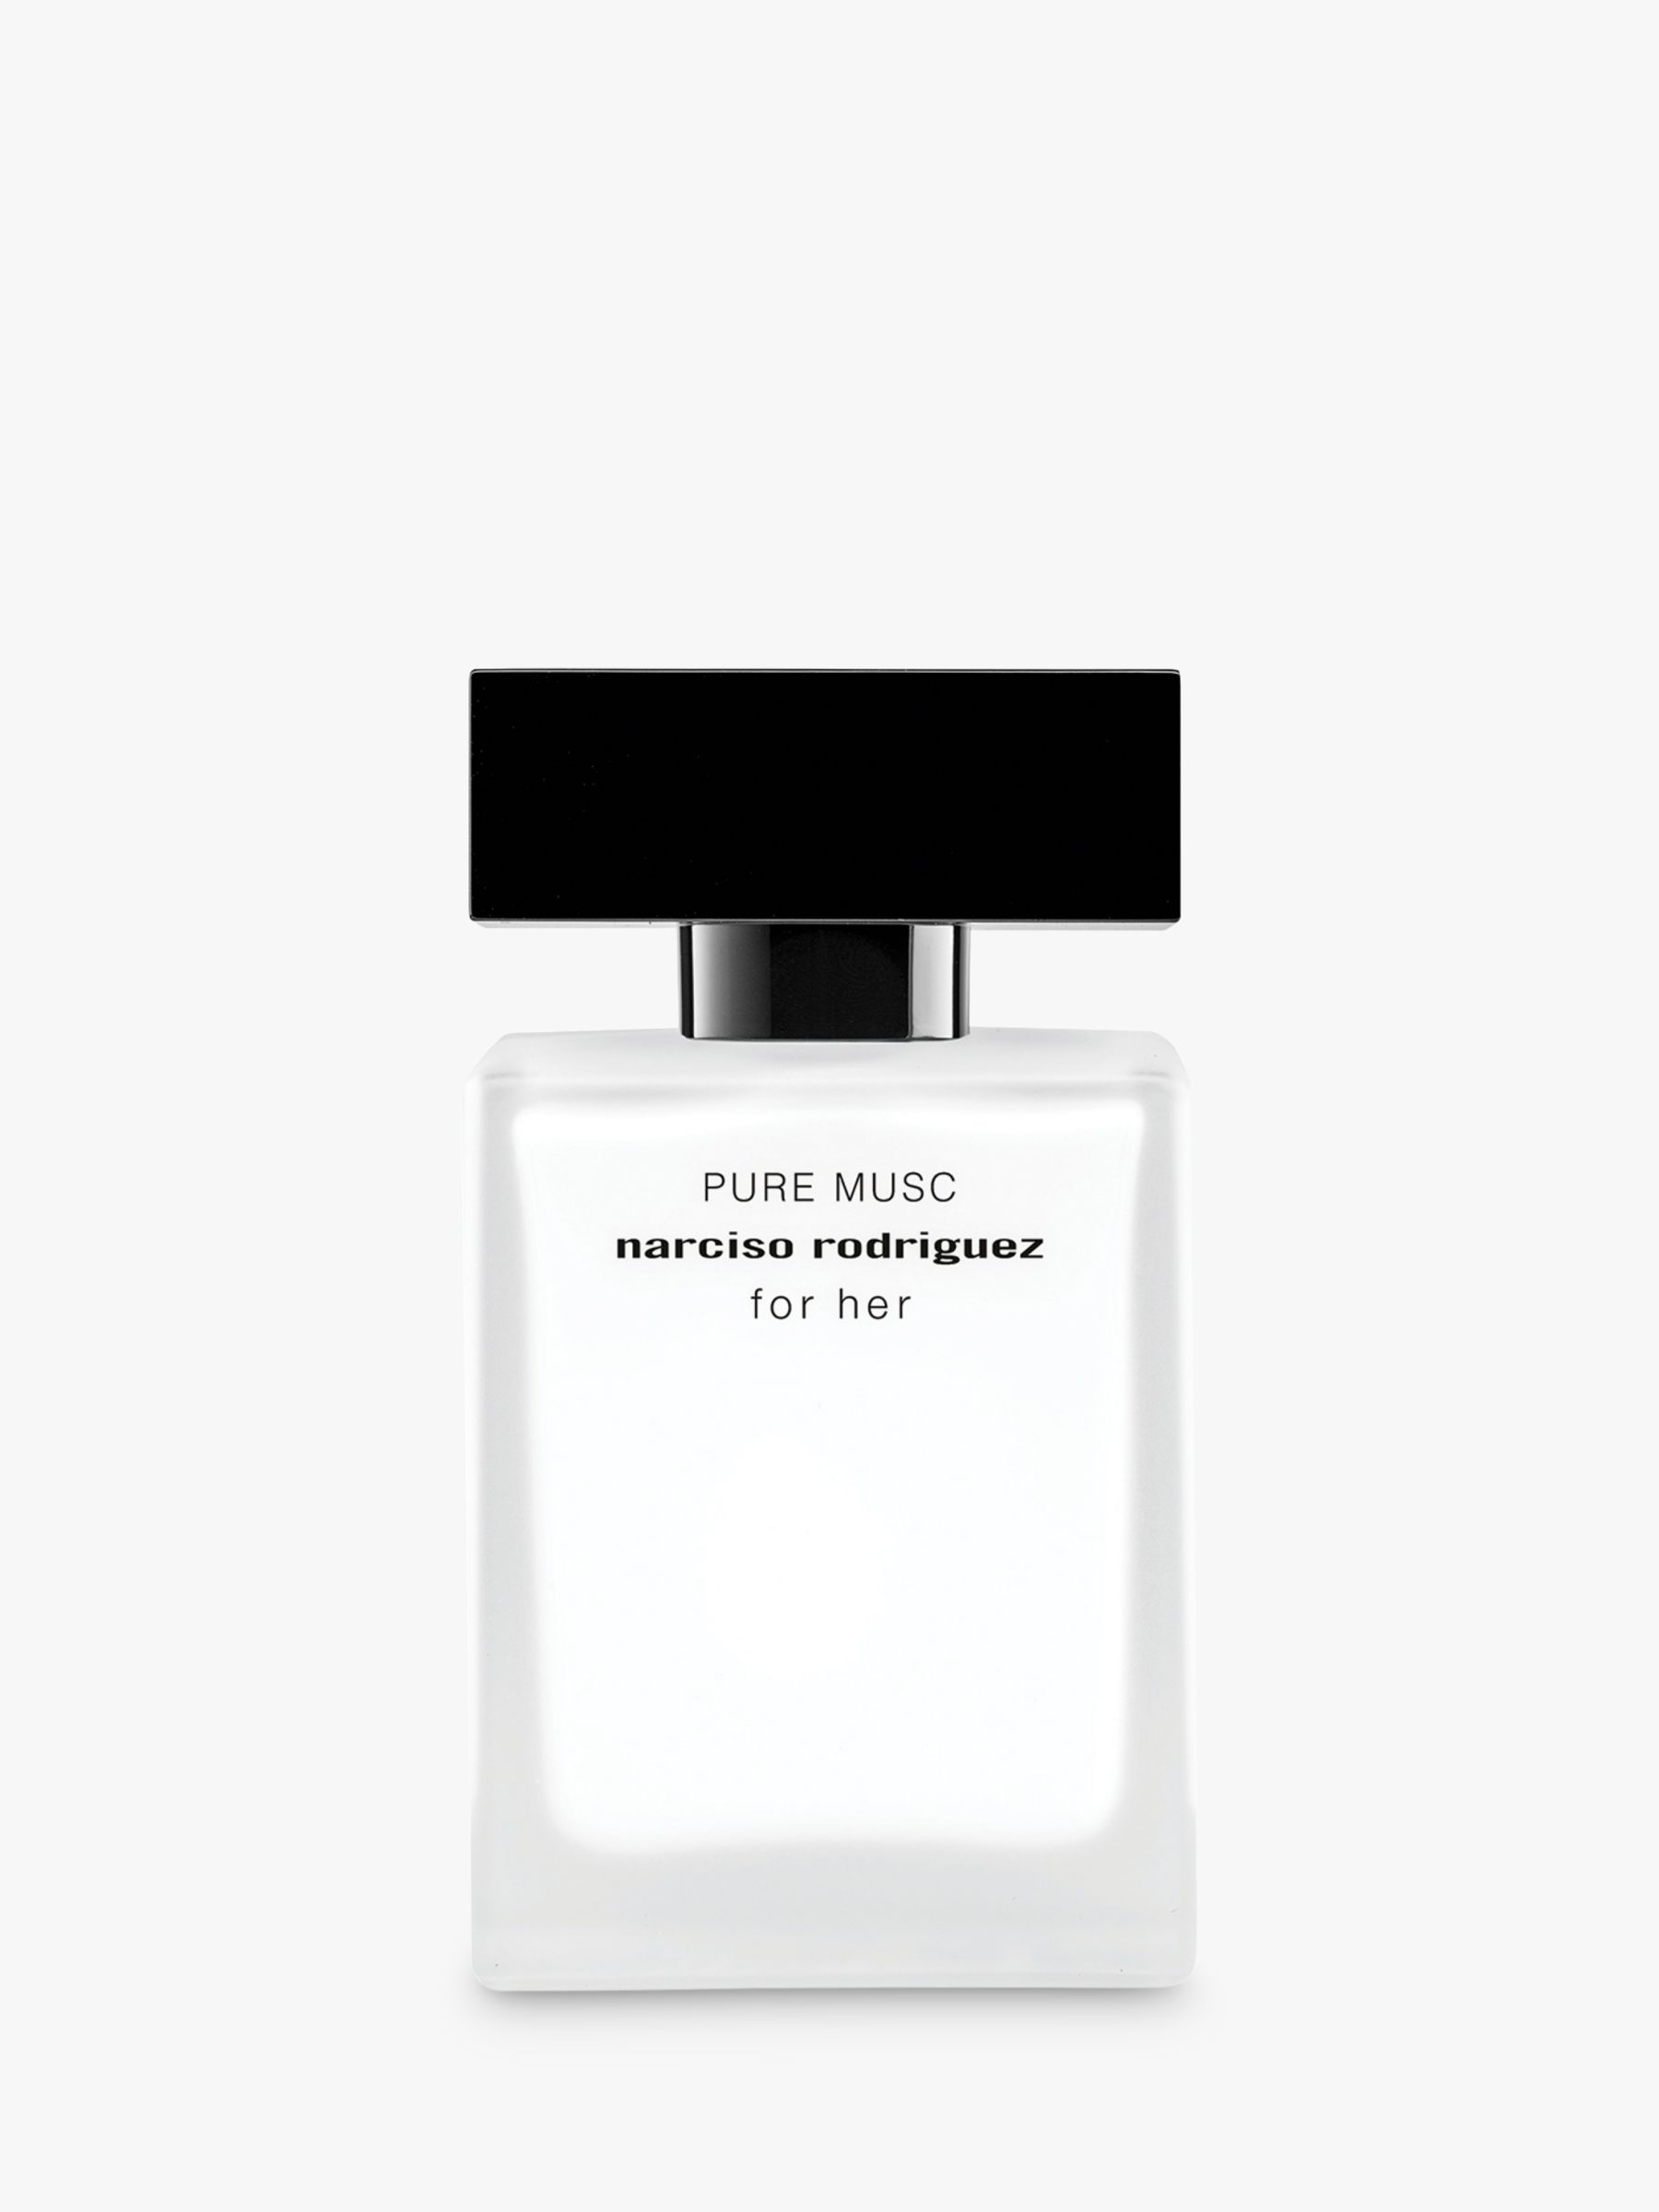 Narciso Rodriguez Narciso Rodriguez For Her Pure Musc Eau de Parfum